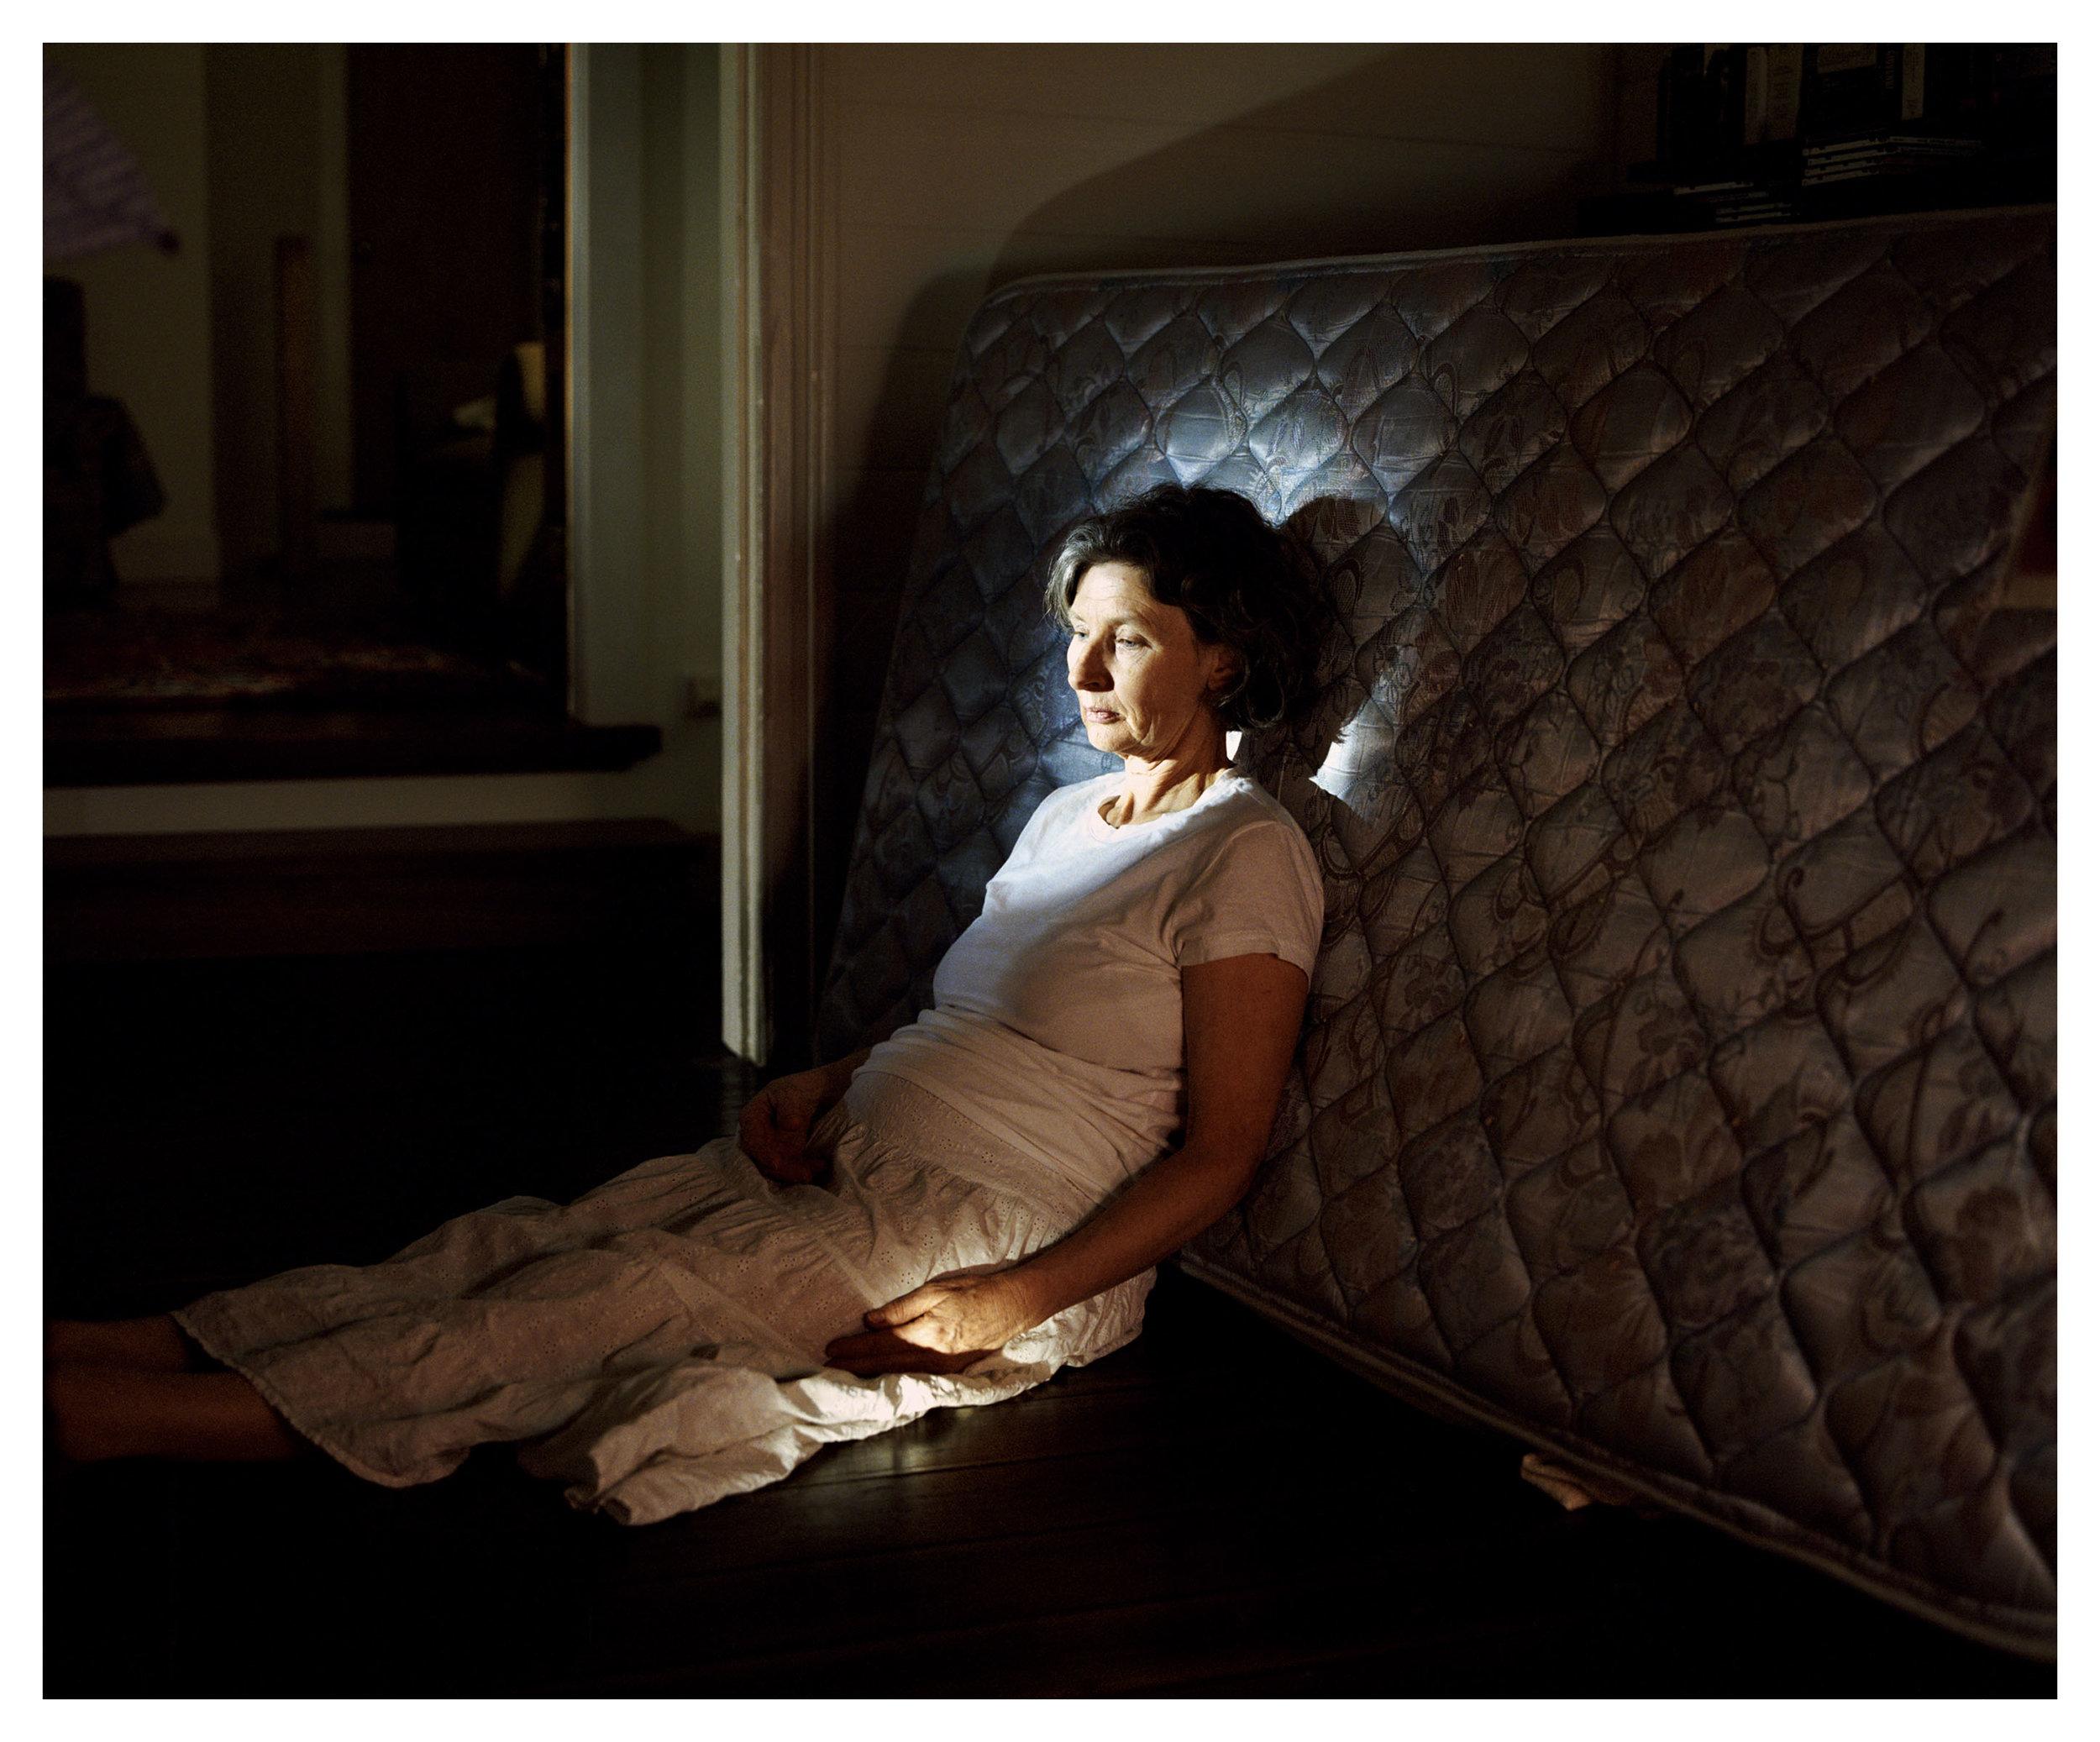 Joan Cameron-Smith, Untitled, 2006, c-type print, 76.2 x 101.6cm A